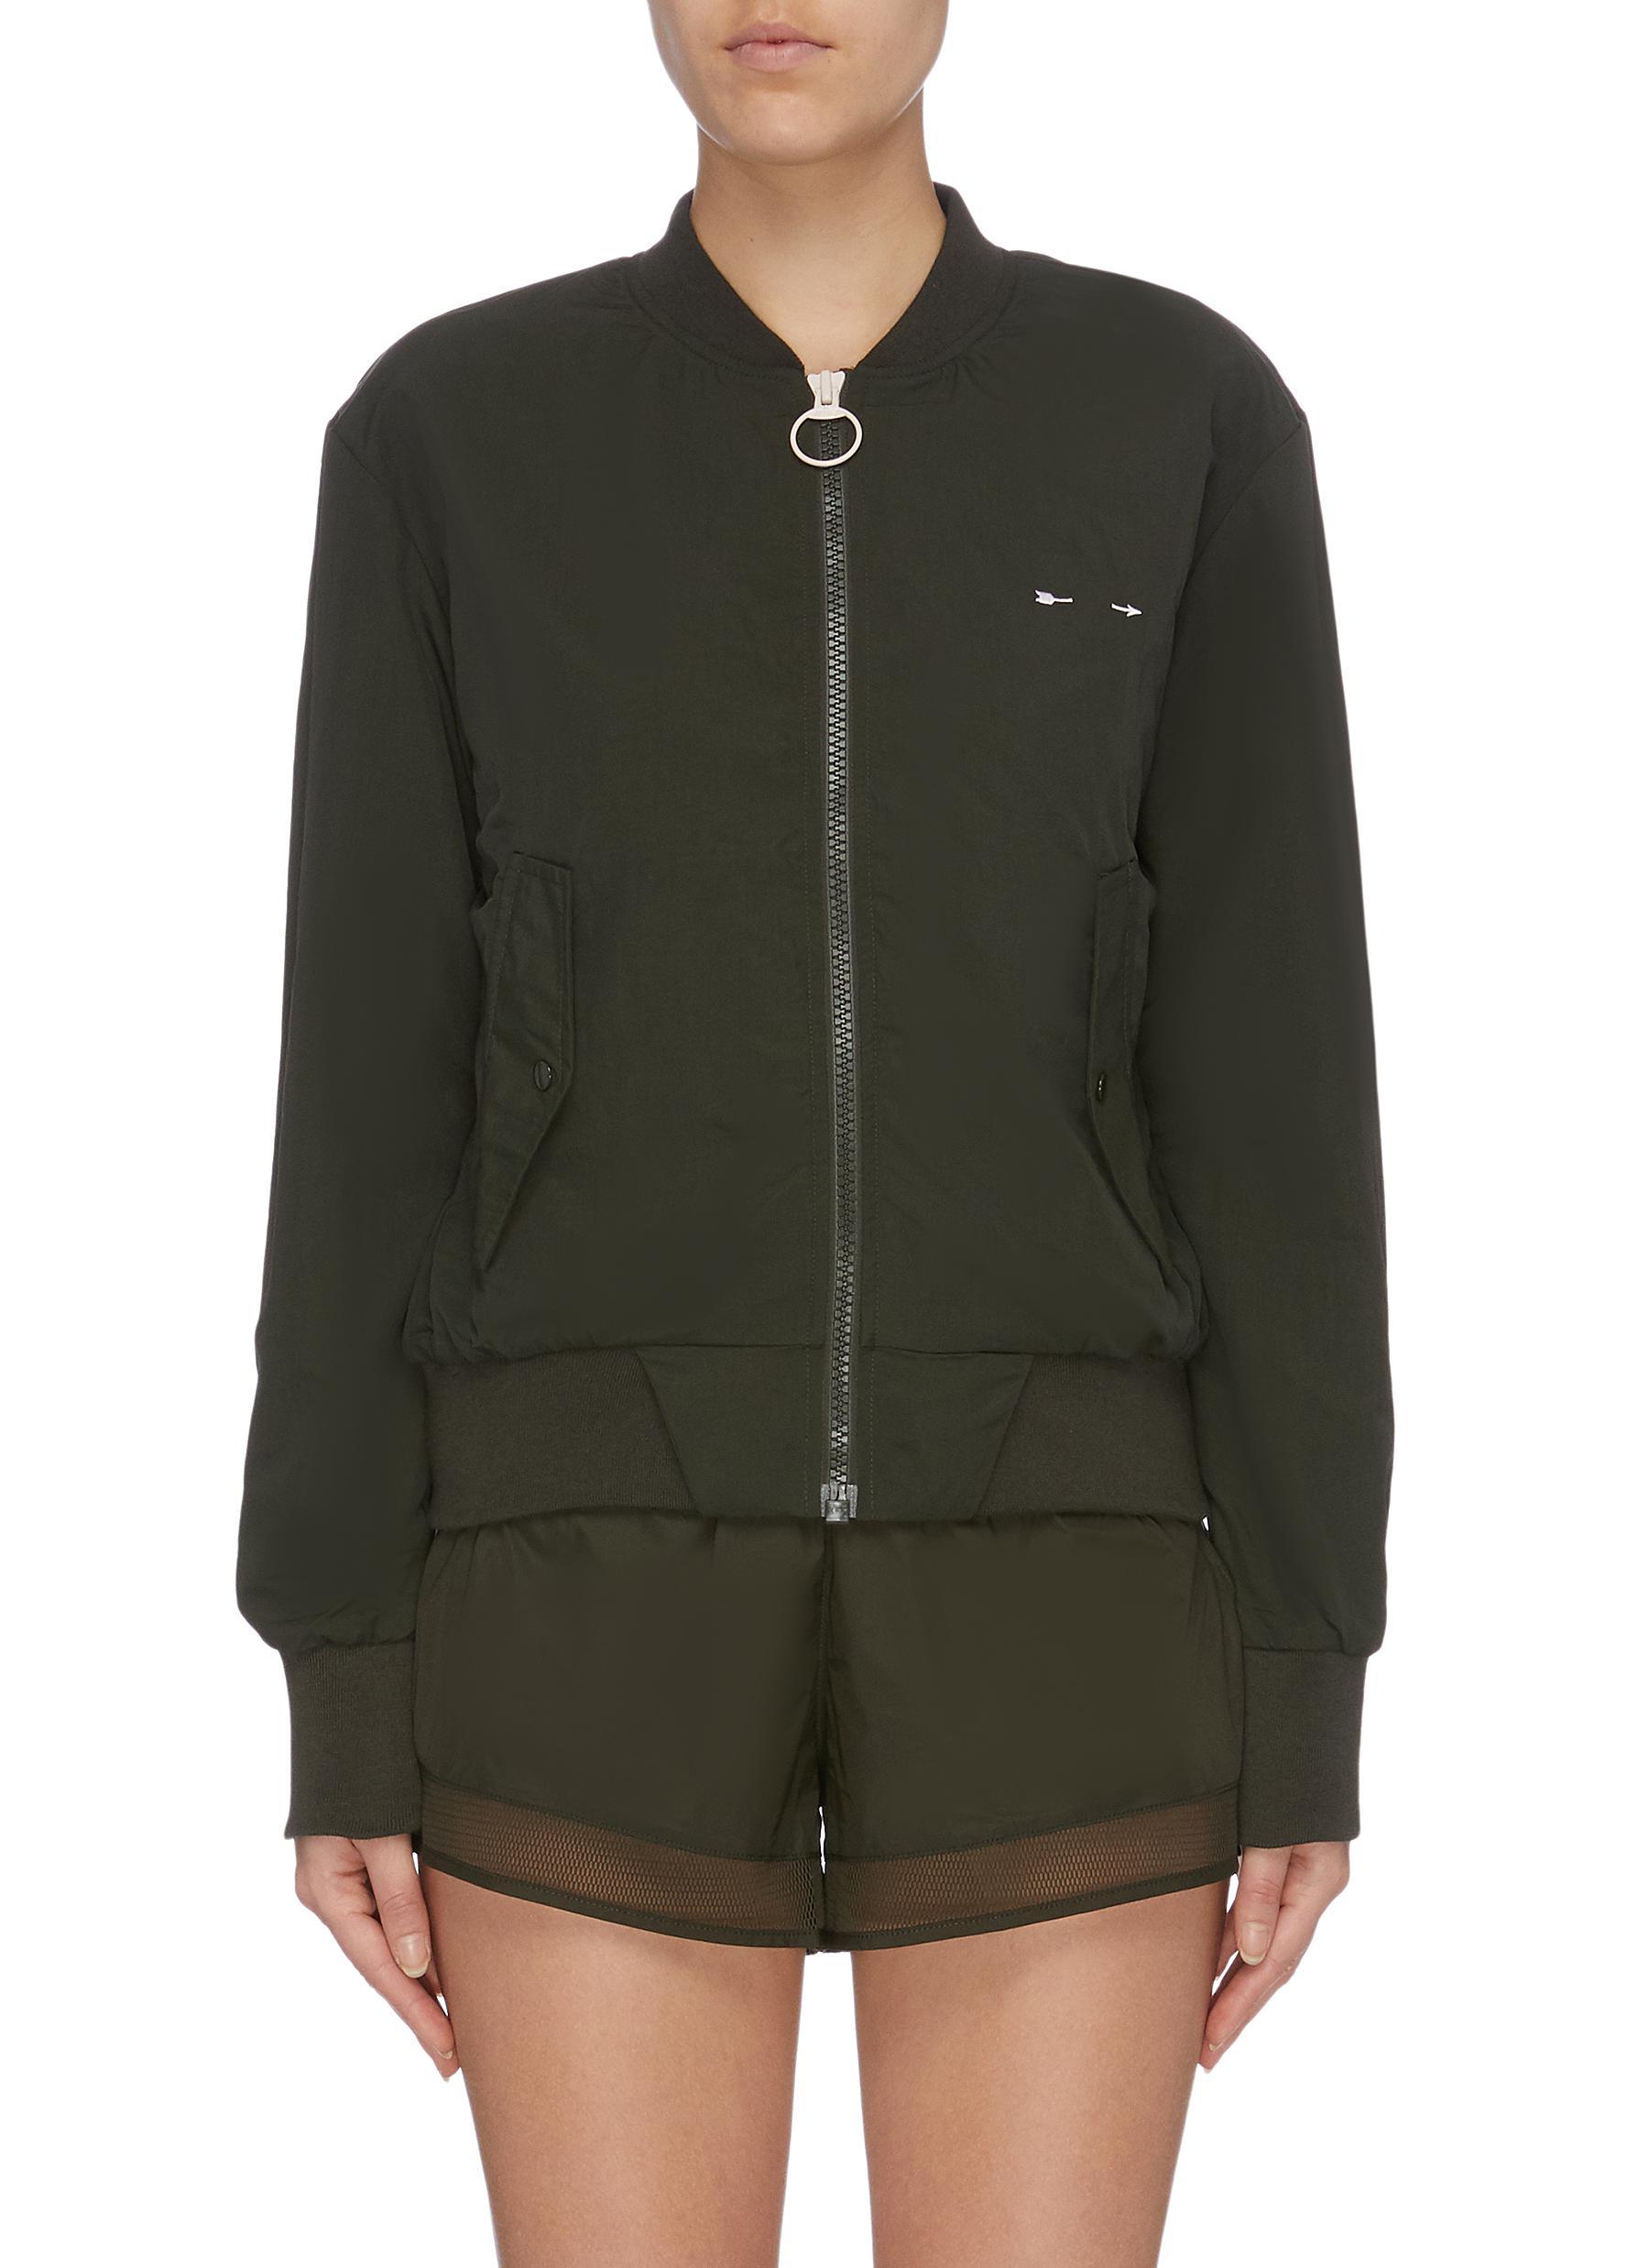 Chloe bomber jacket by The Upside